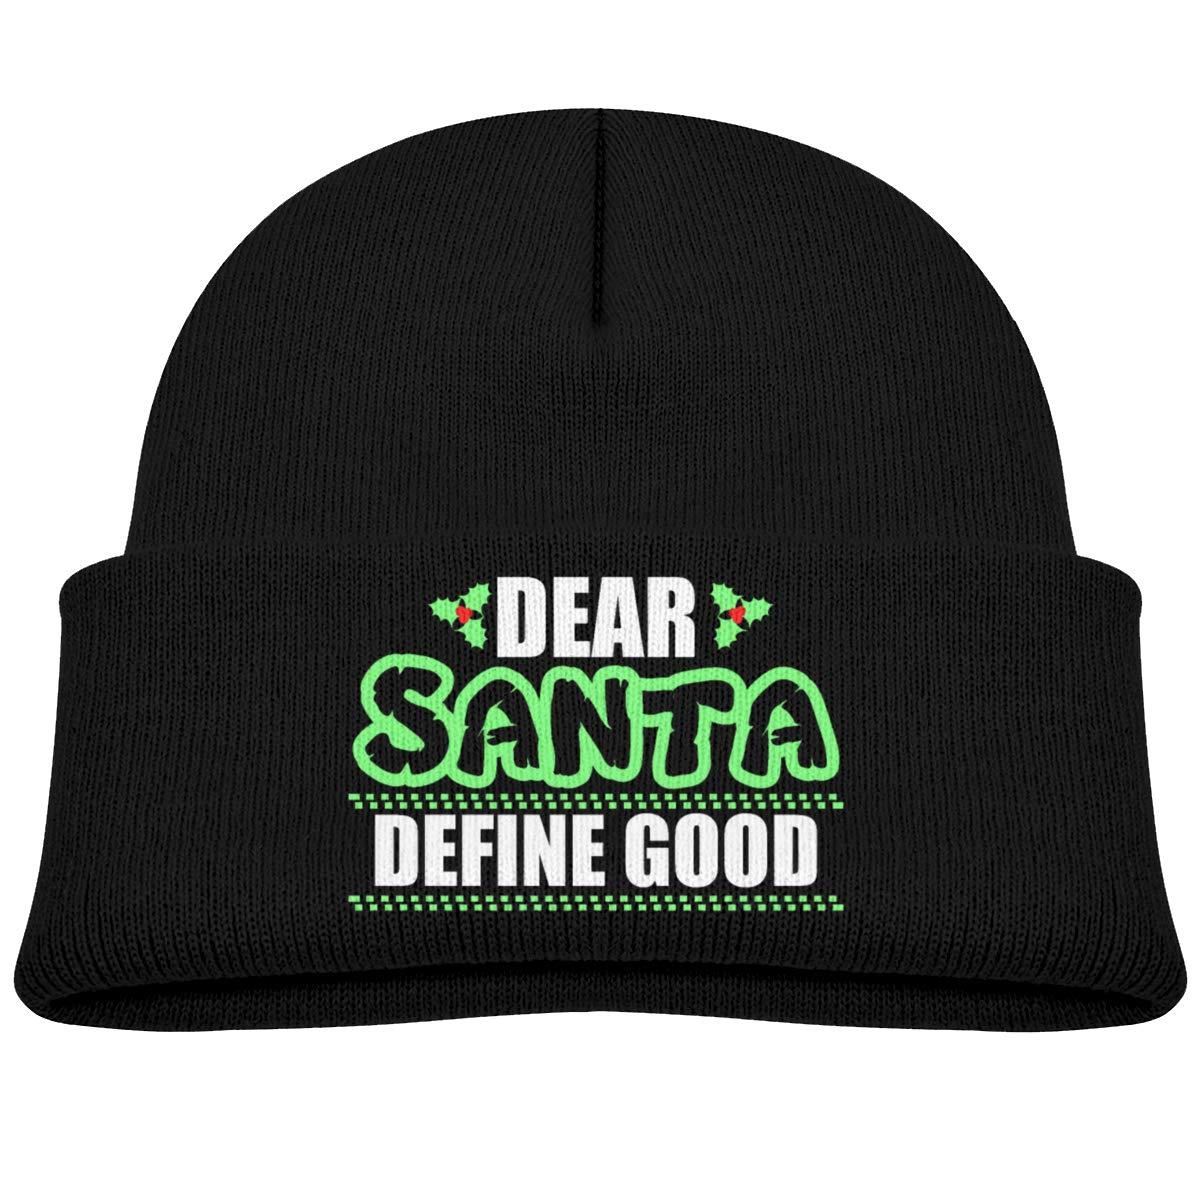 Hanfjj Kefdk Dear Santa Define Good Infant Skull Hats Baby Boys Beanie Caps